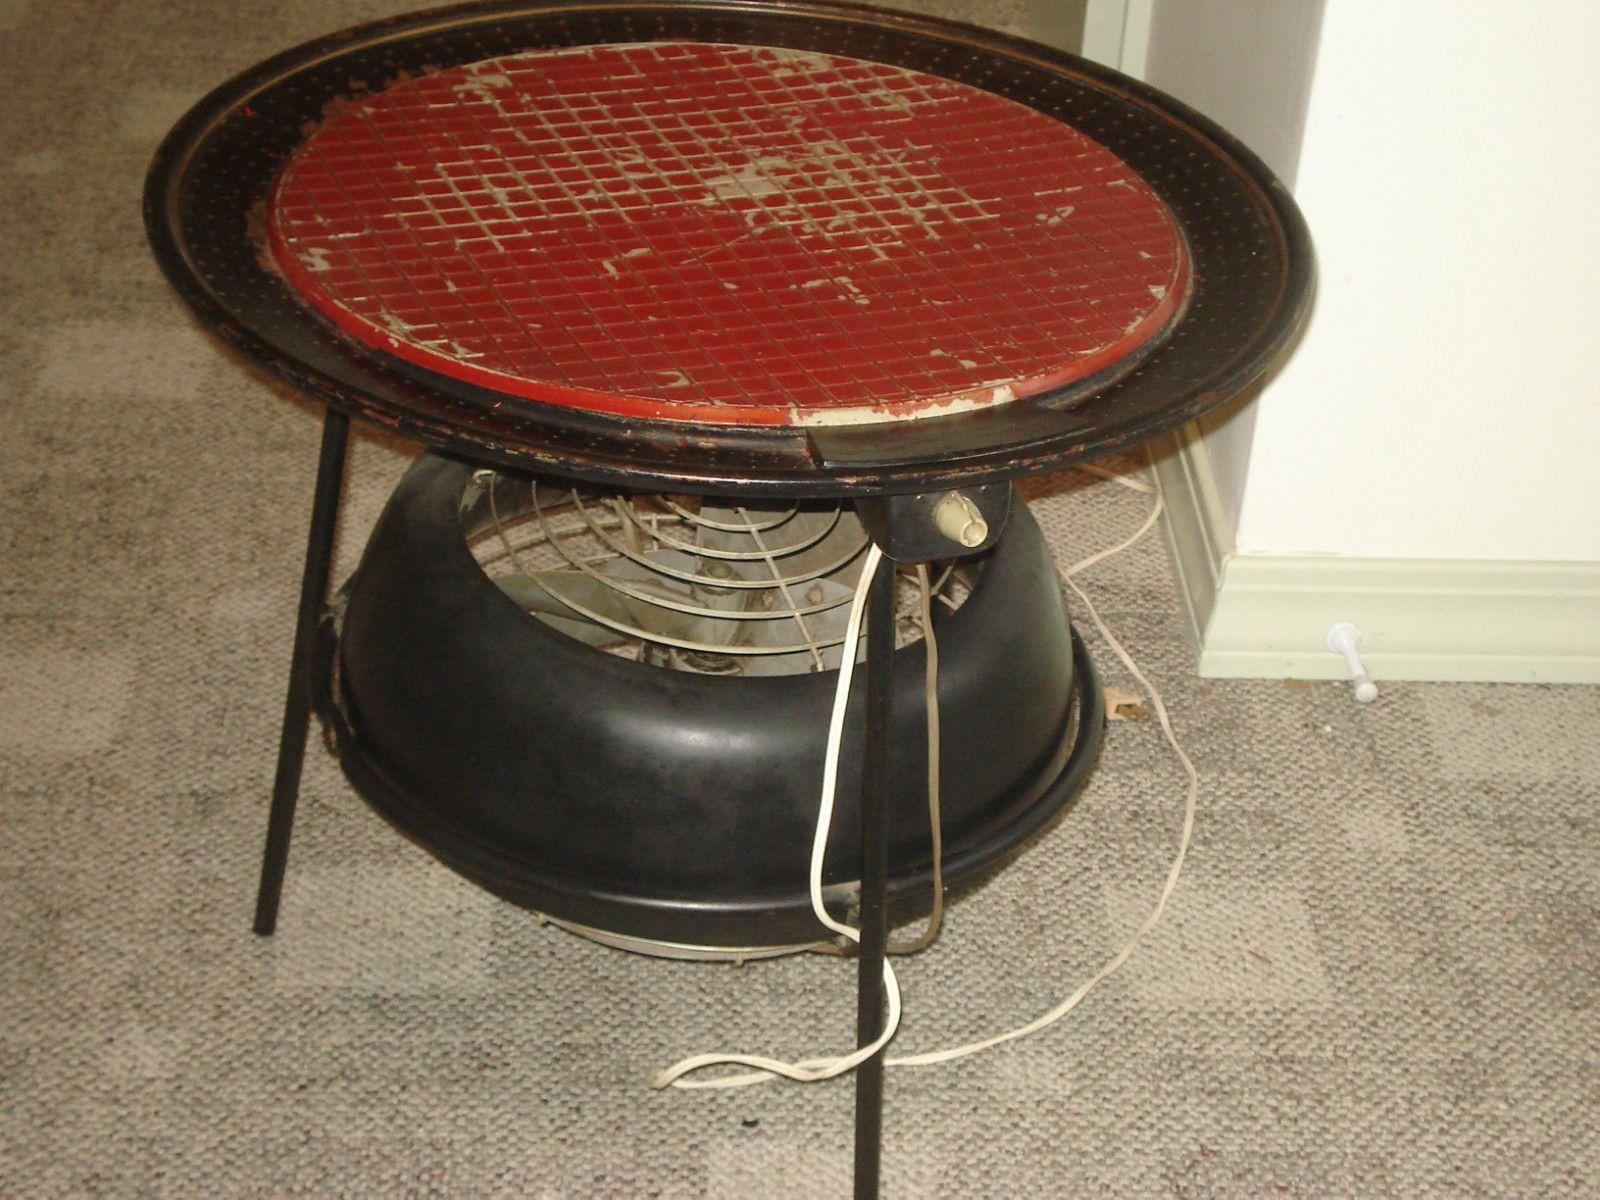 Vintage Vornado Turnabout Hock Fan 28f1 1 Atomic Design Clic Table